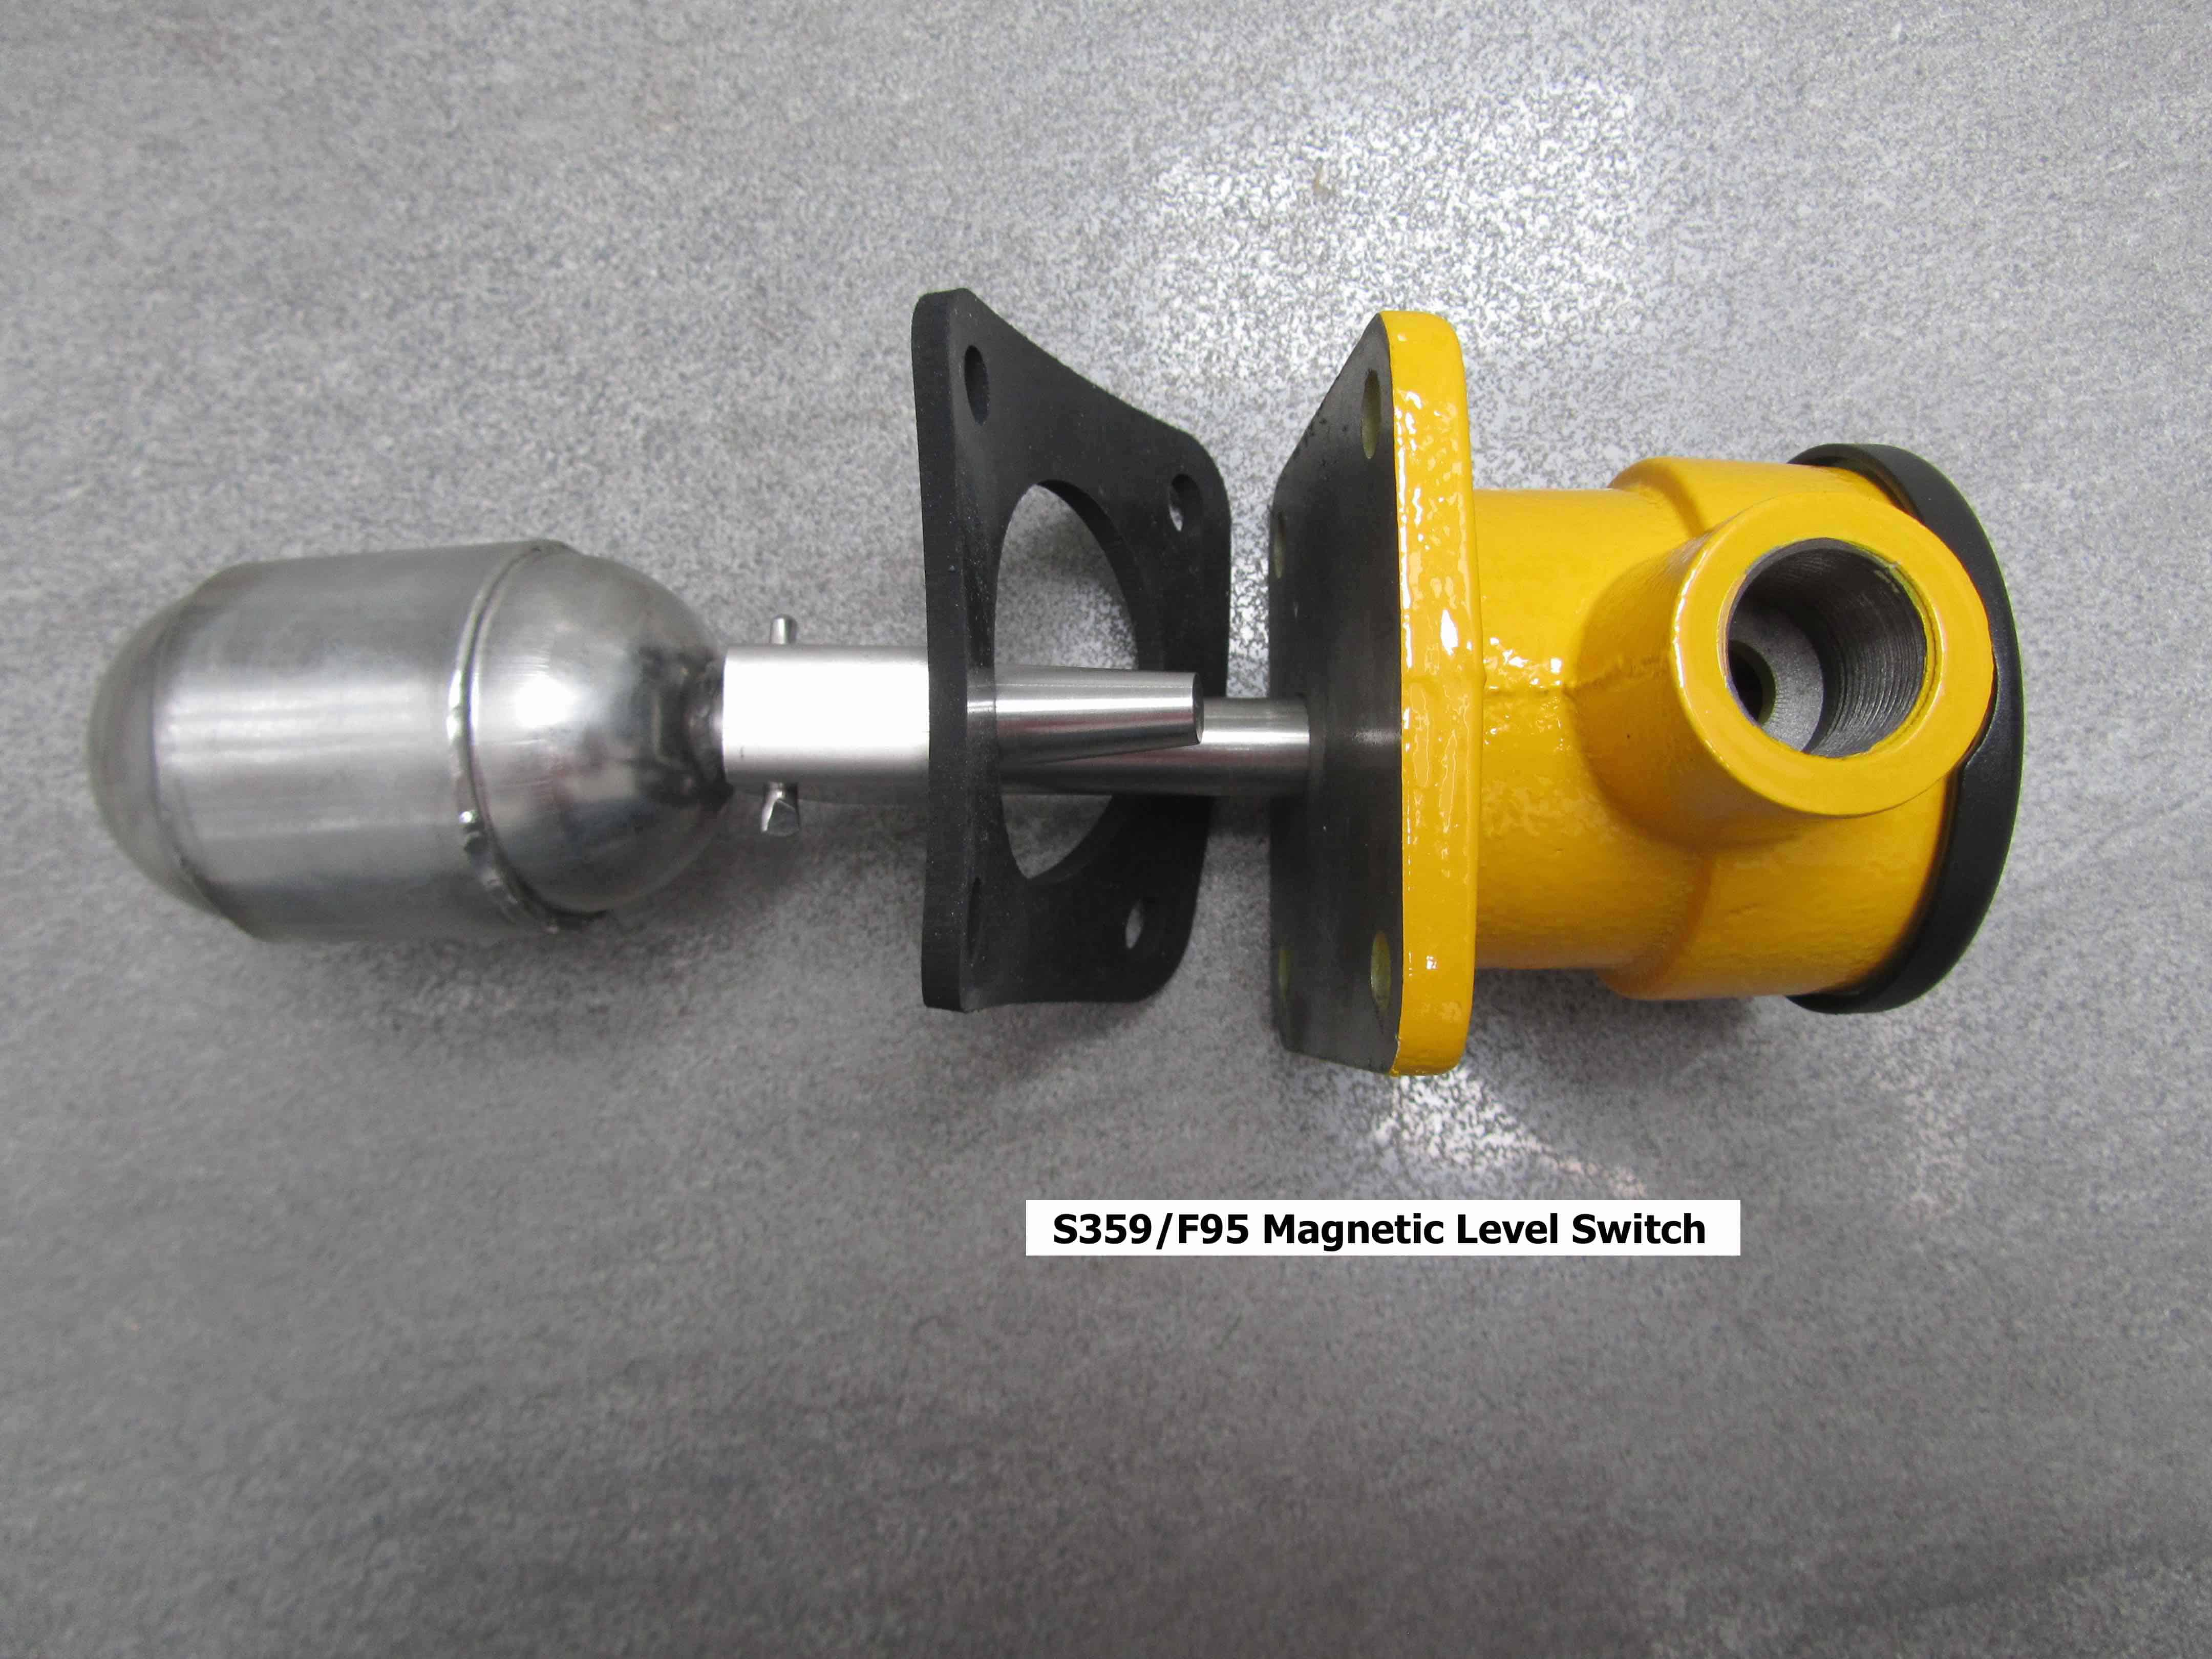 S359:F95 Level Switch